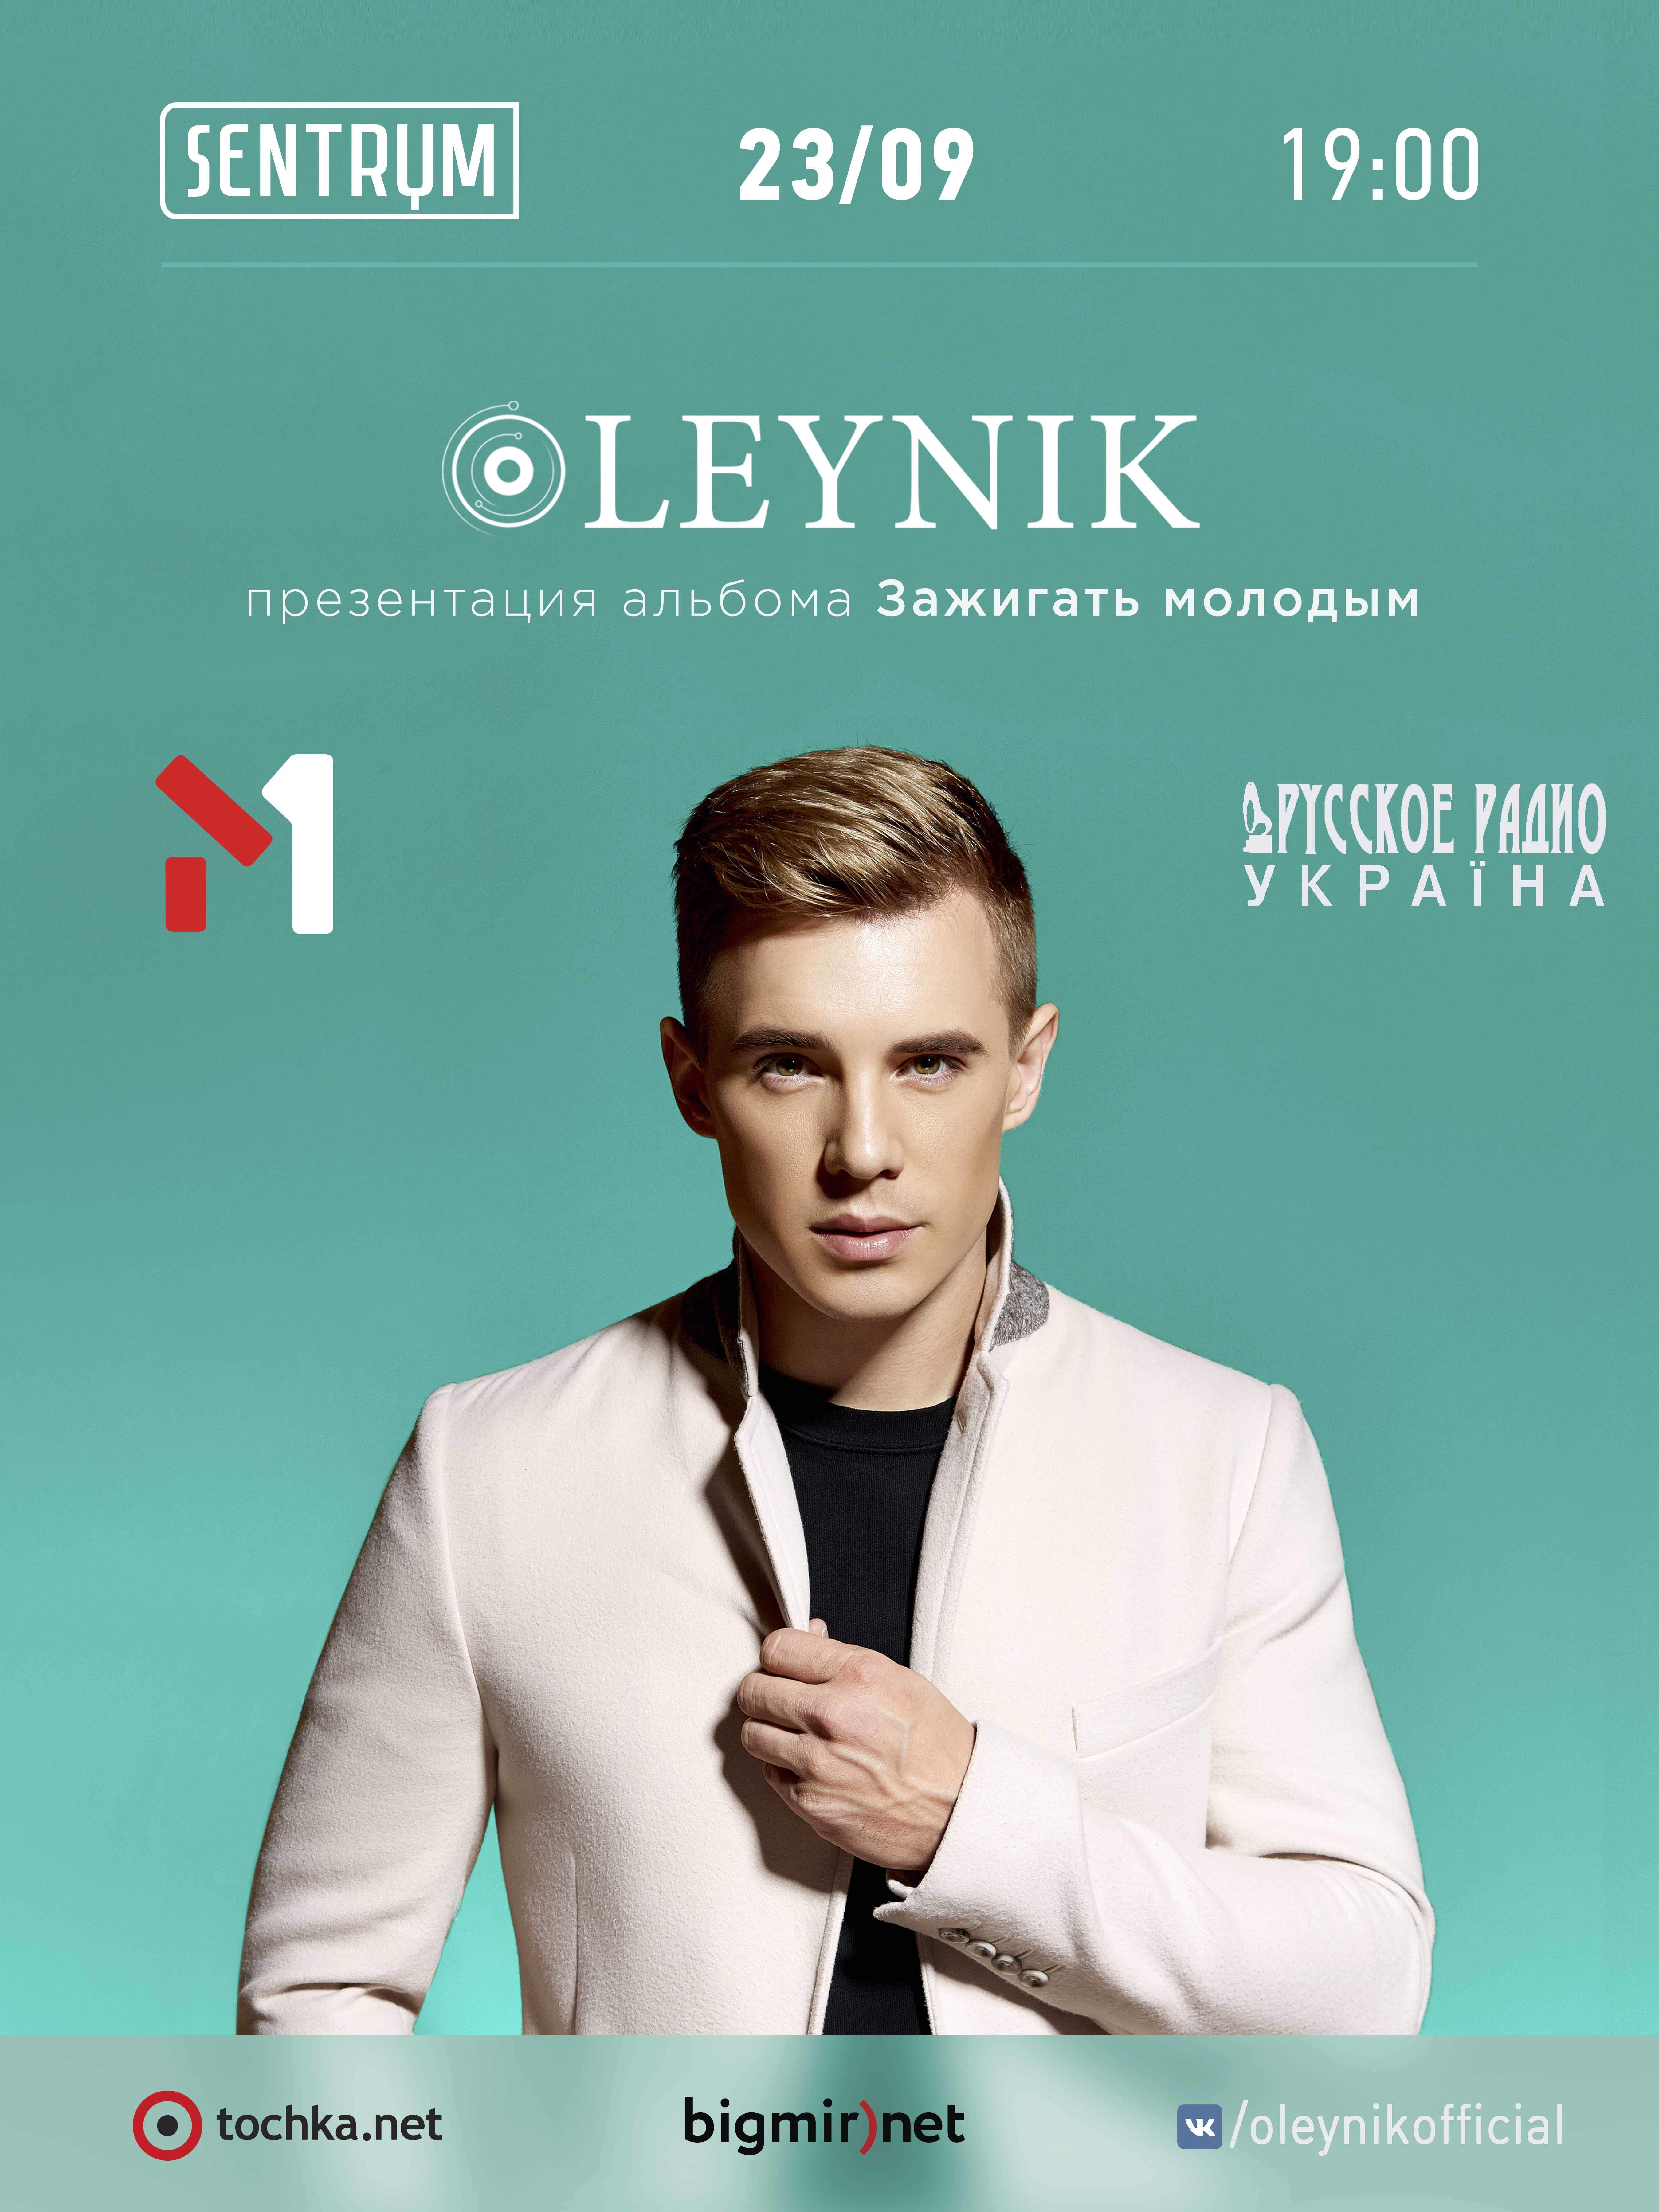 OLEYNIK «Зажигать молодым»